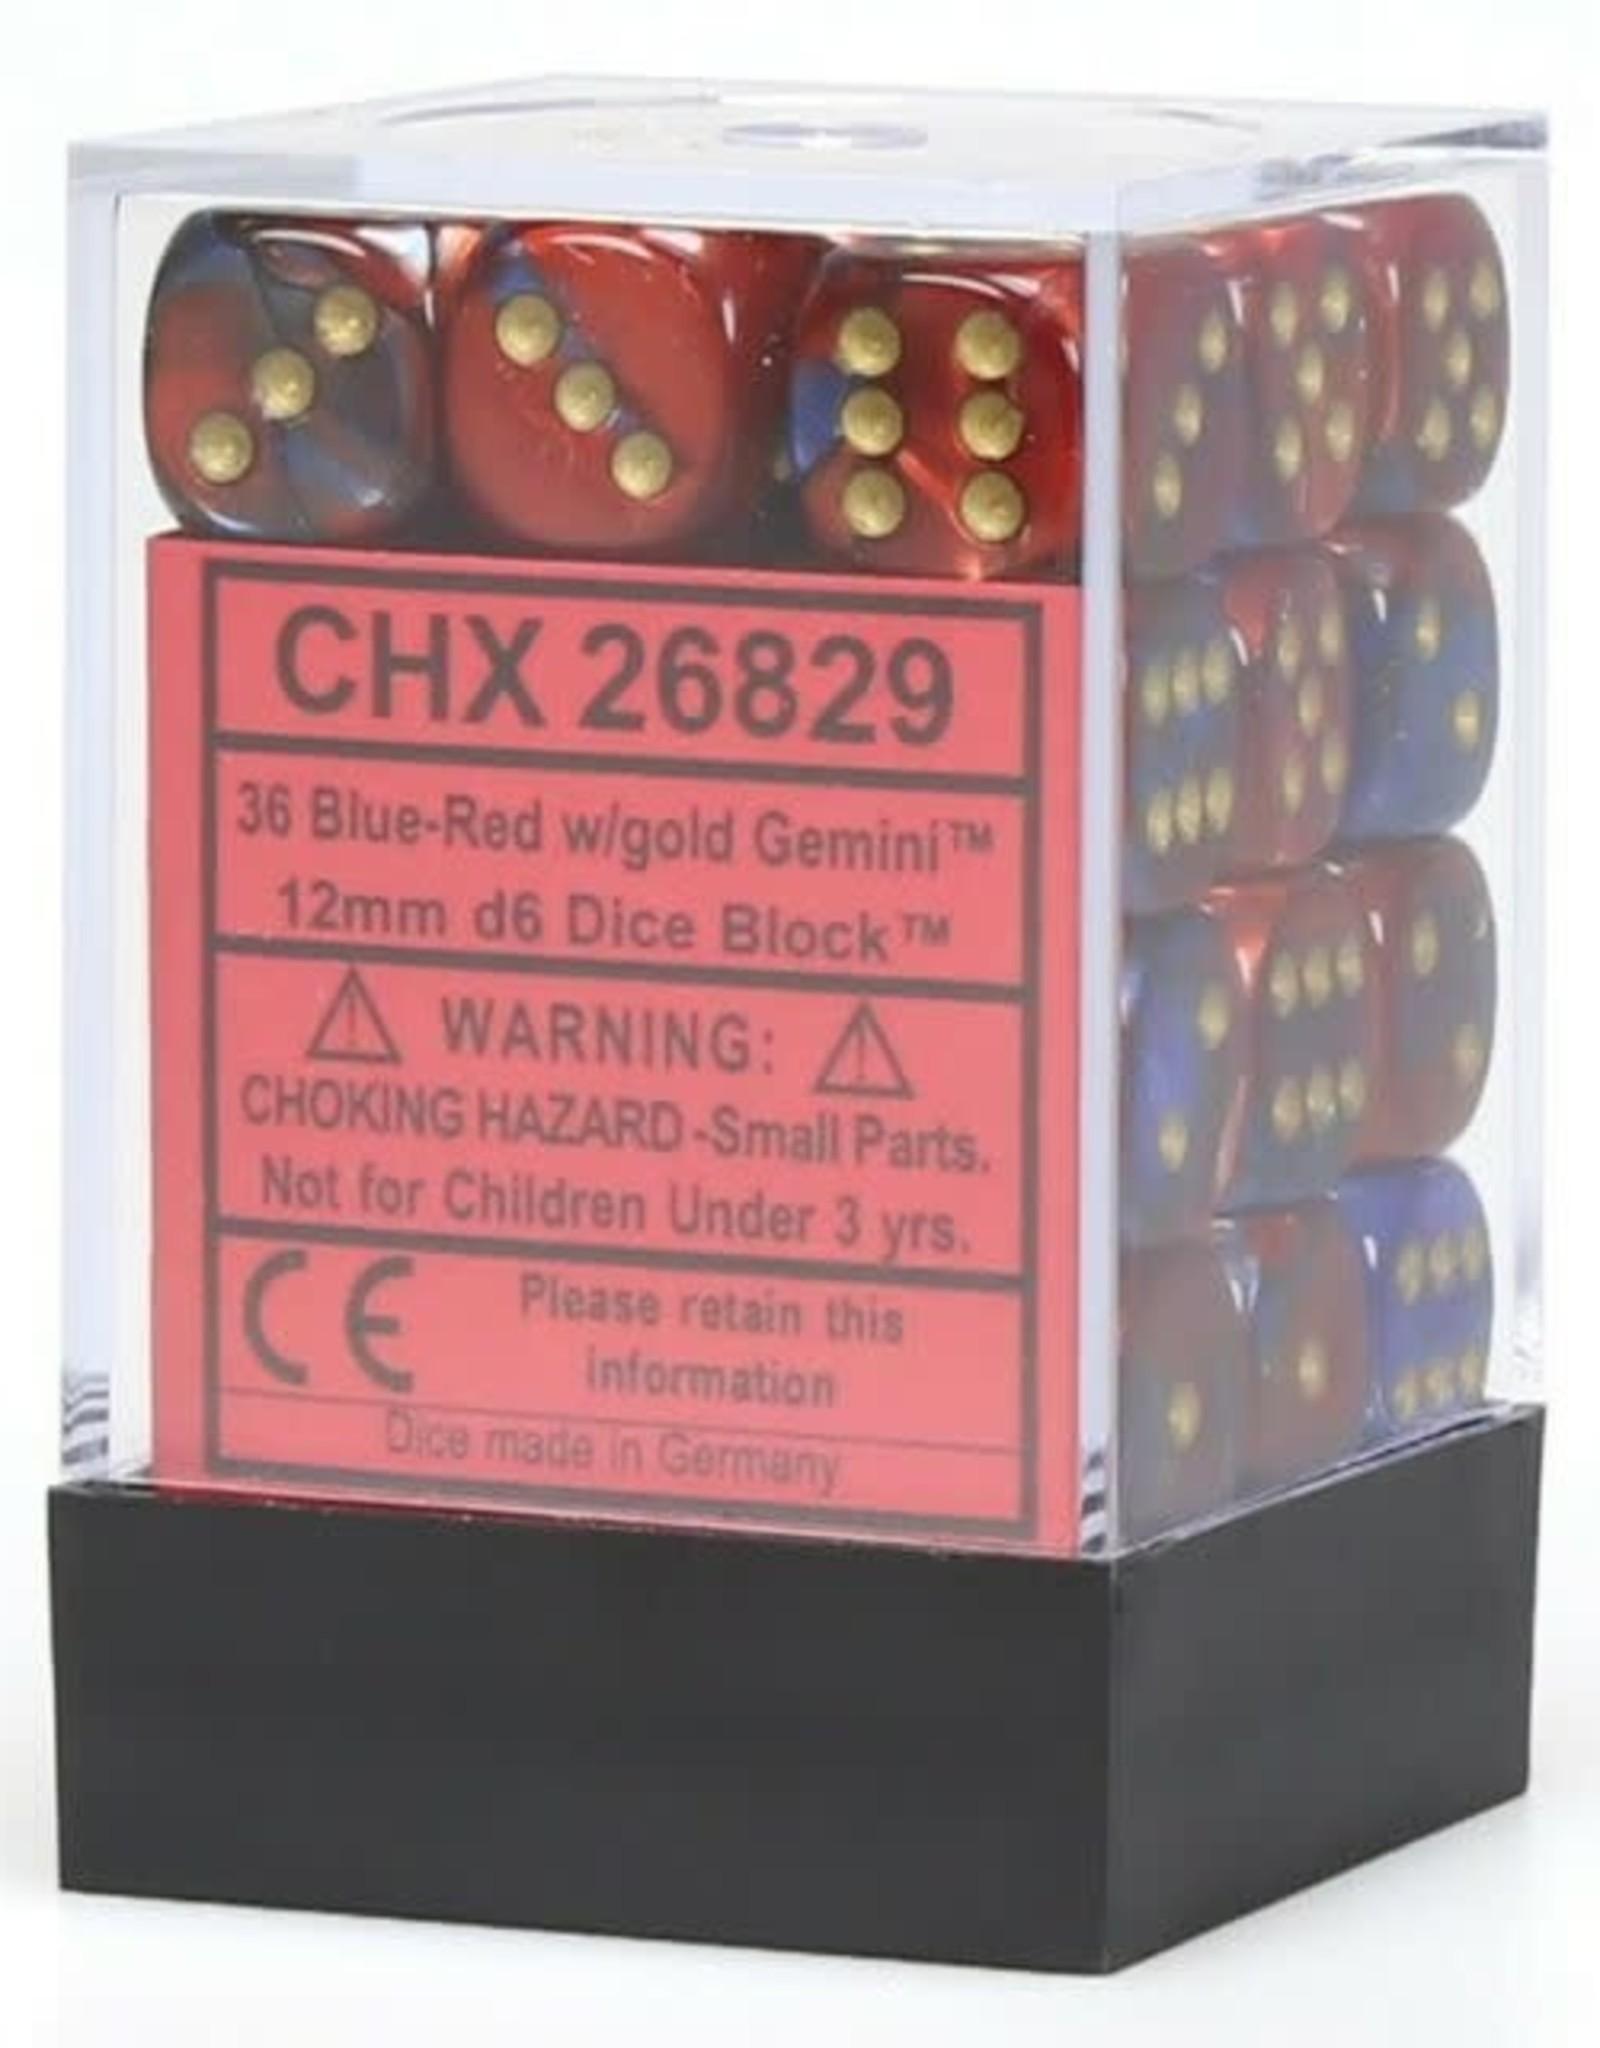 Chessex Blue-Red w/gold Gemini 12mm d6 dice set